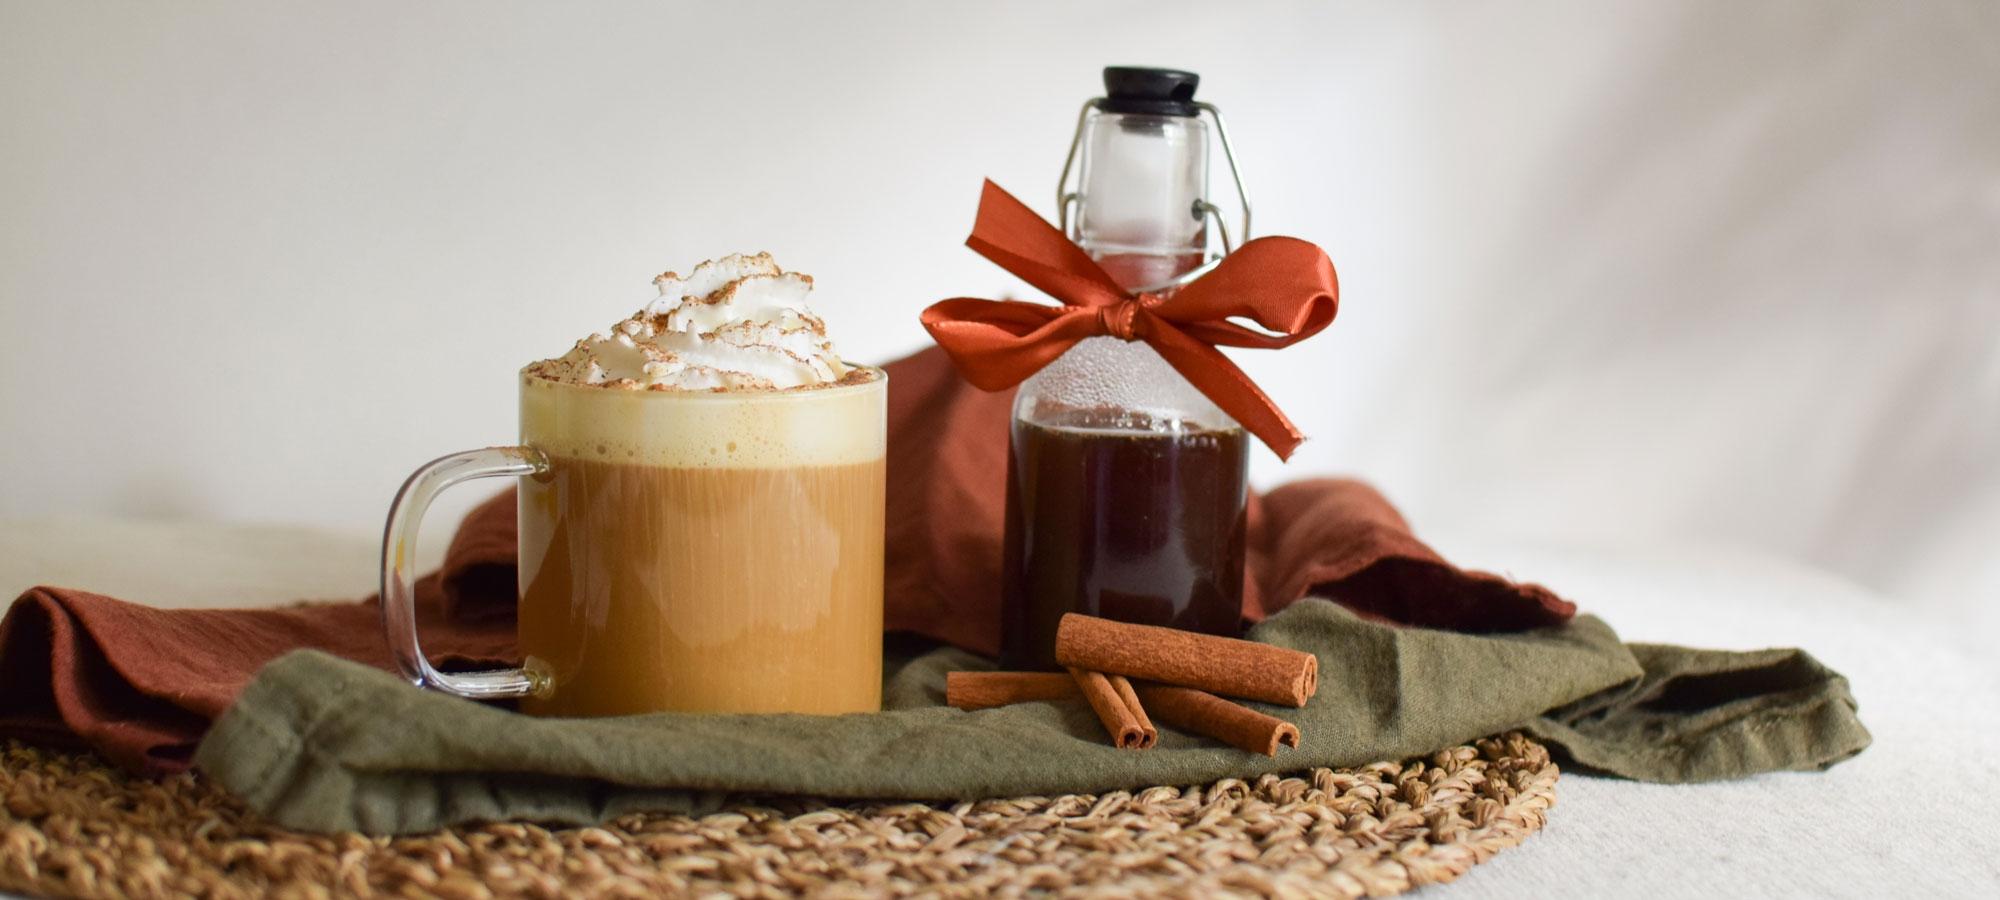 Jouluinen Caffé Latte maistuu appelsiini-kanelilta ja se valmistuu Juhla Mokka -kahvista